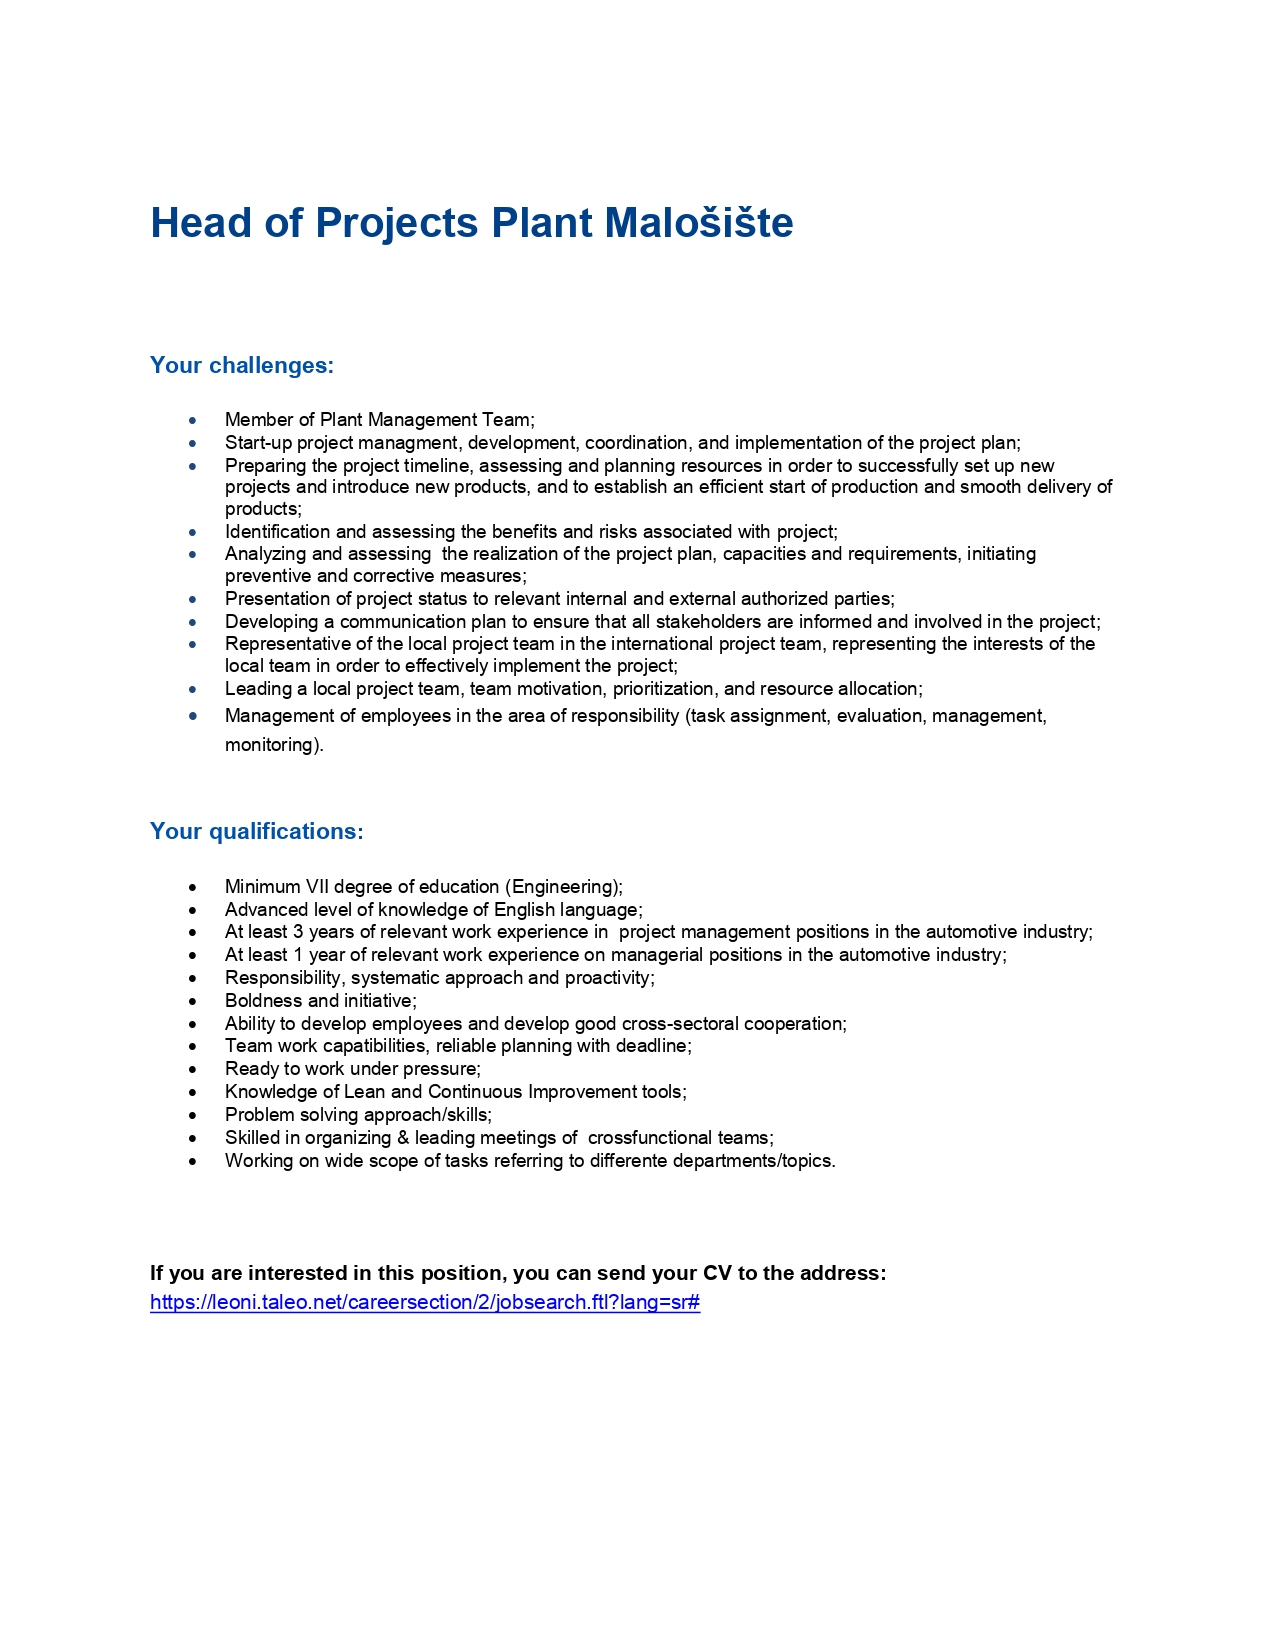 Head of Project Plant Malošište